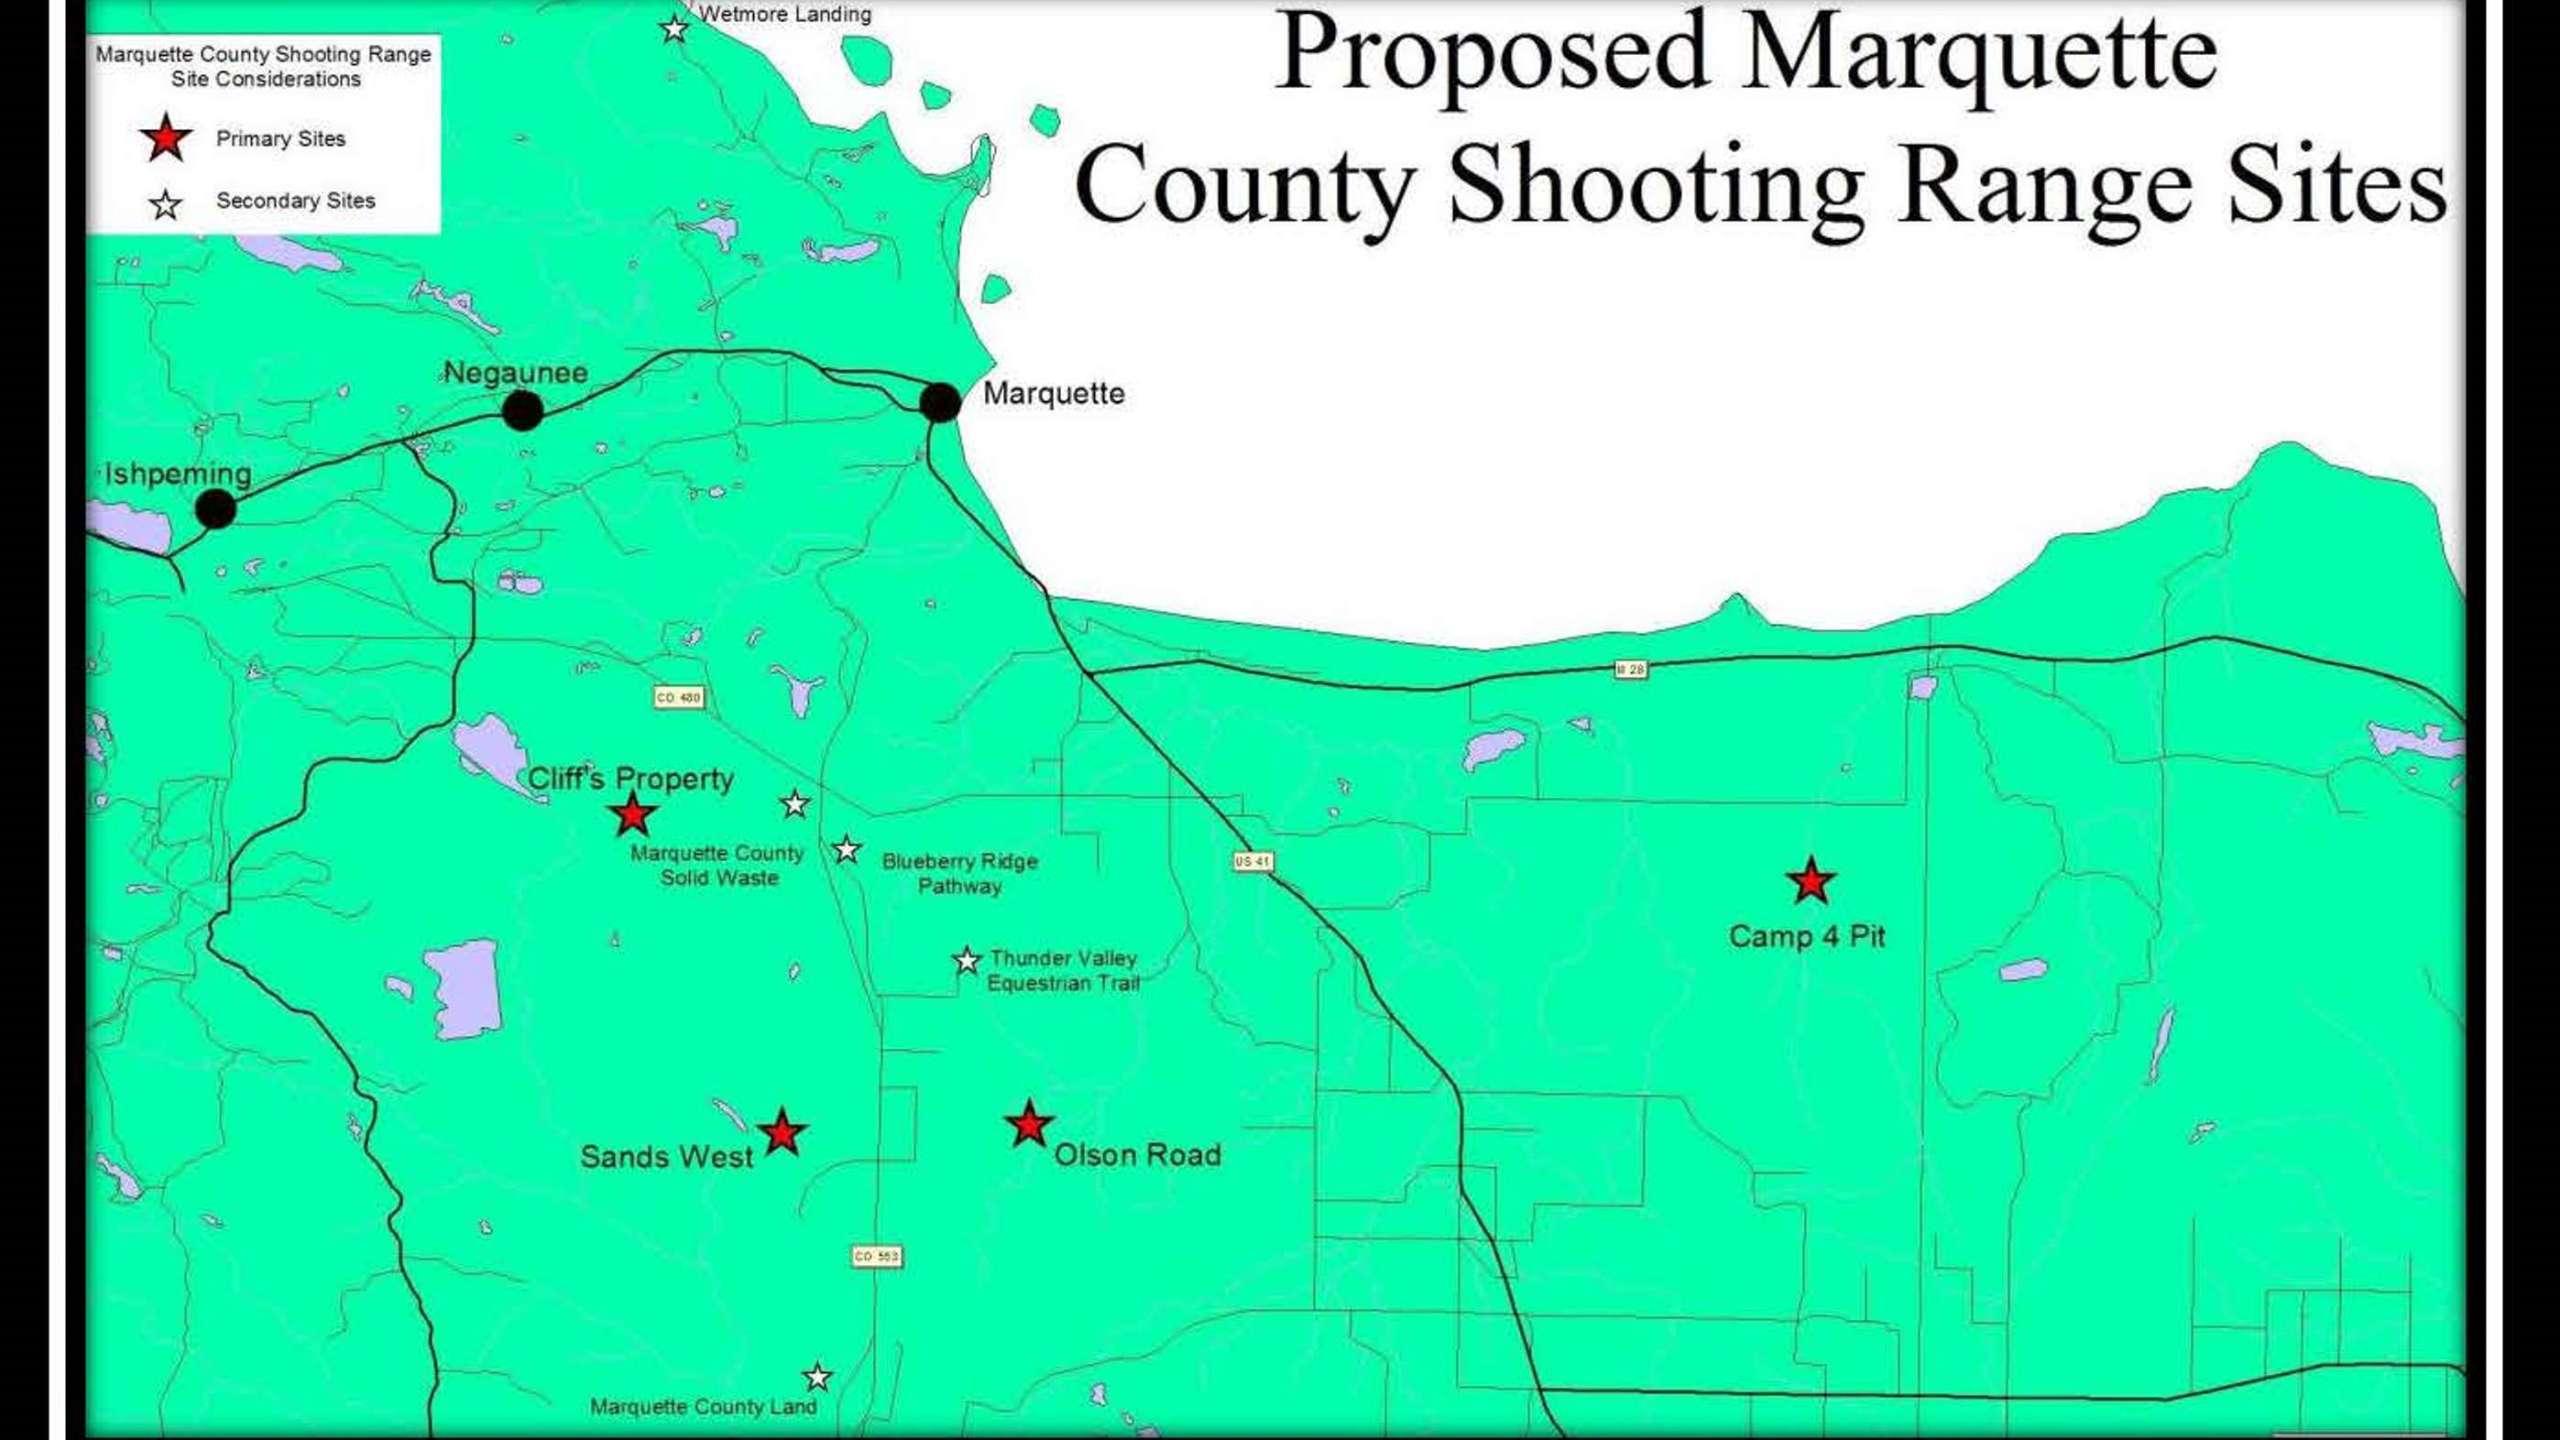 Shooting Range Sites - Marquette County (1)_1485818885277.jpg